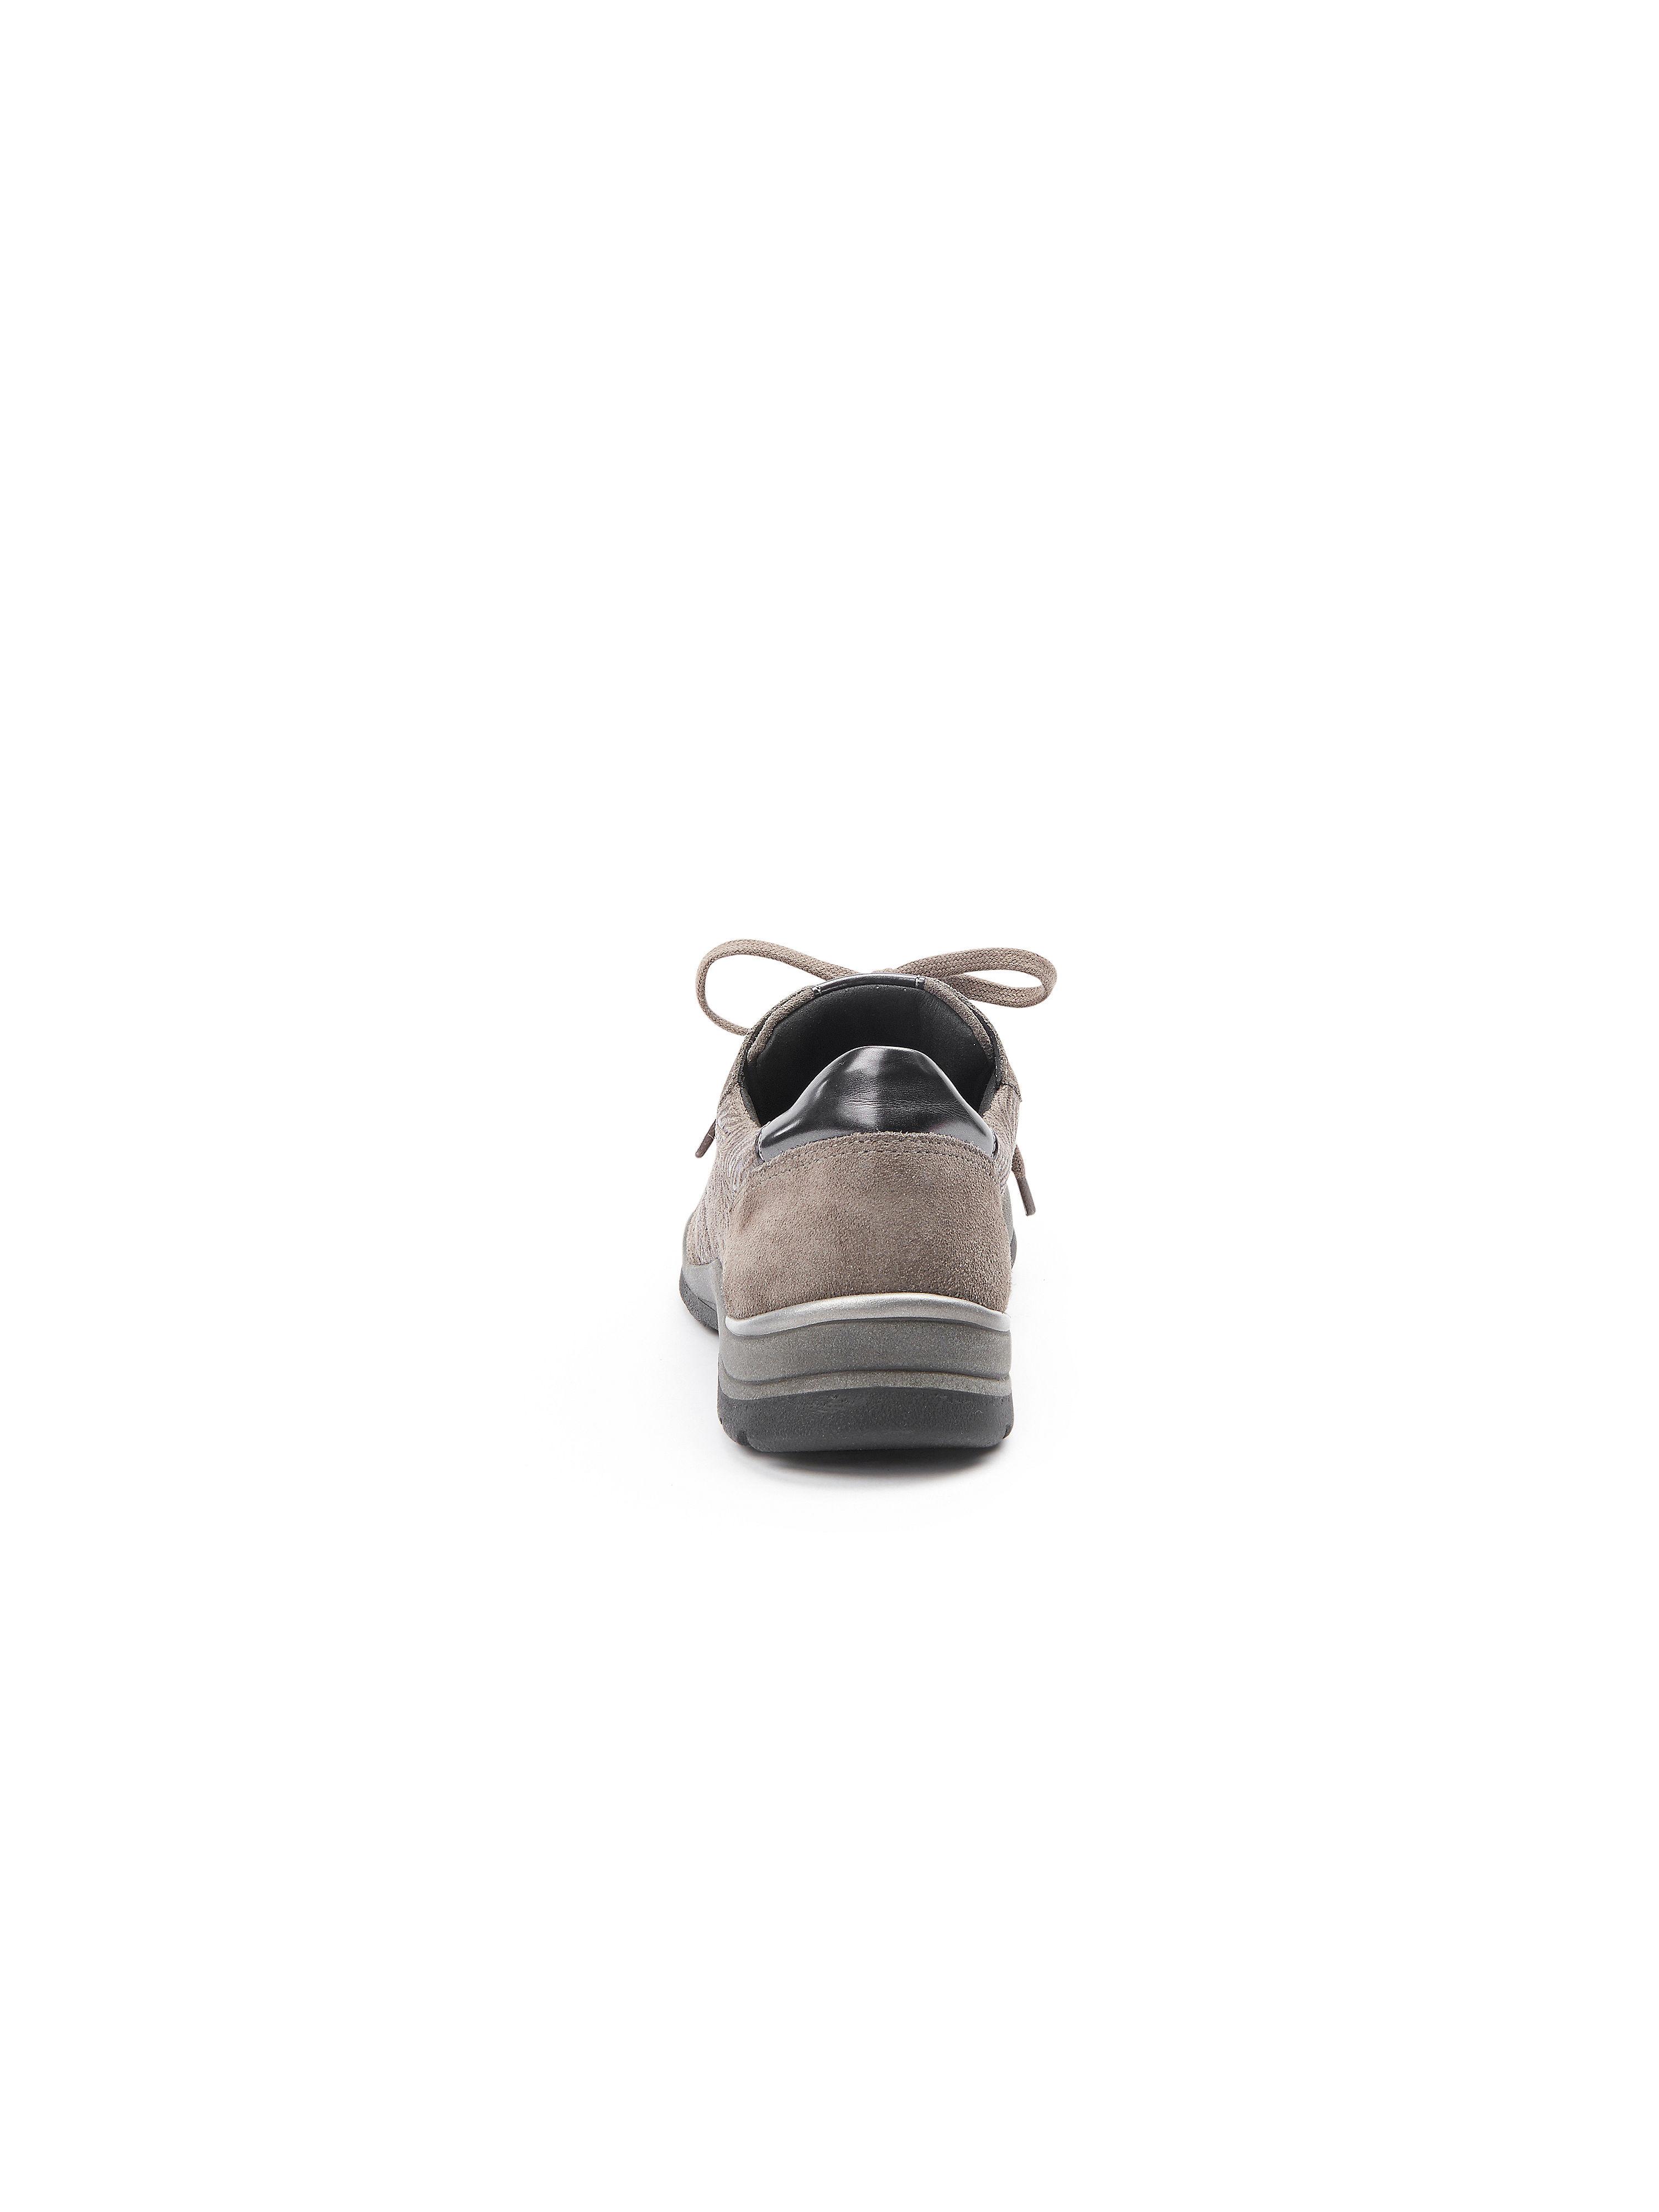 Romika - Schnürer ICARA - Taupe Gute Gute Gute Qualität beliebte Schuhe d4255f